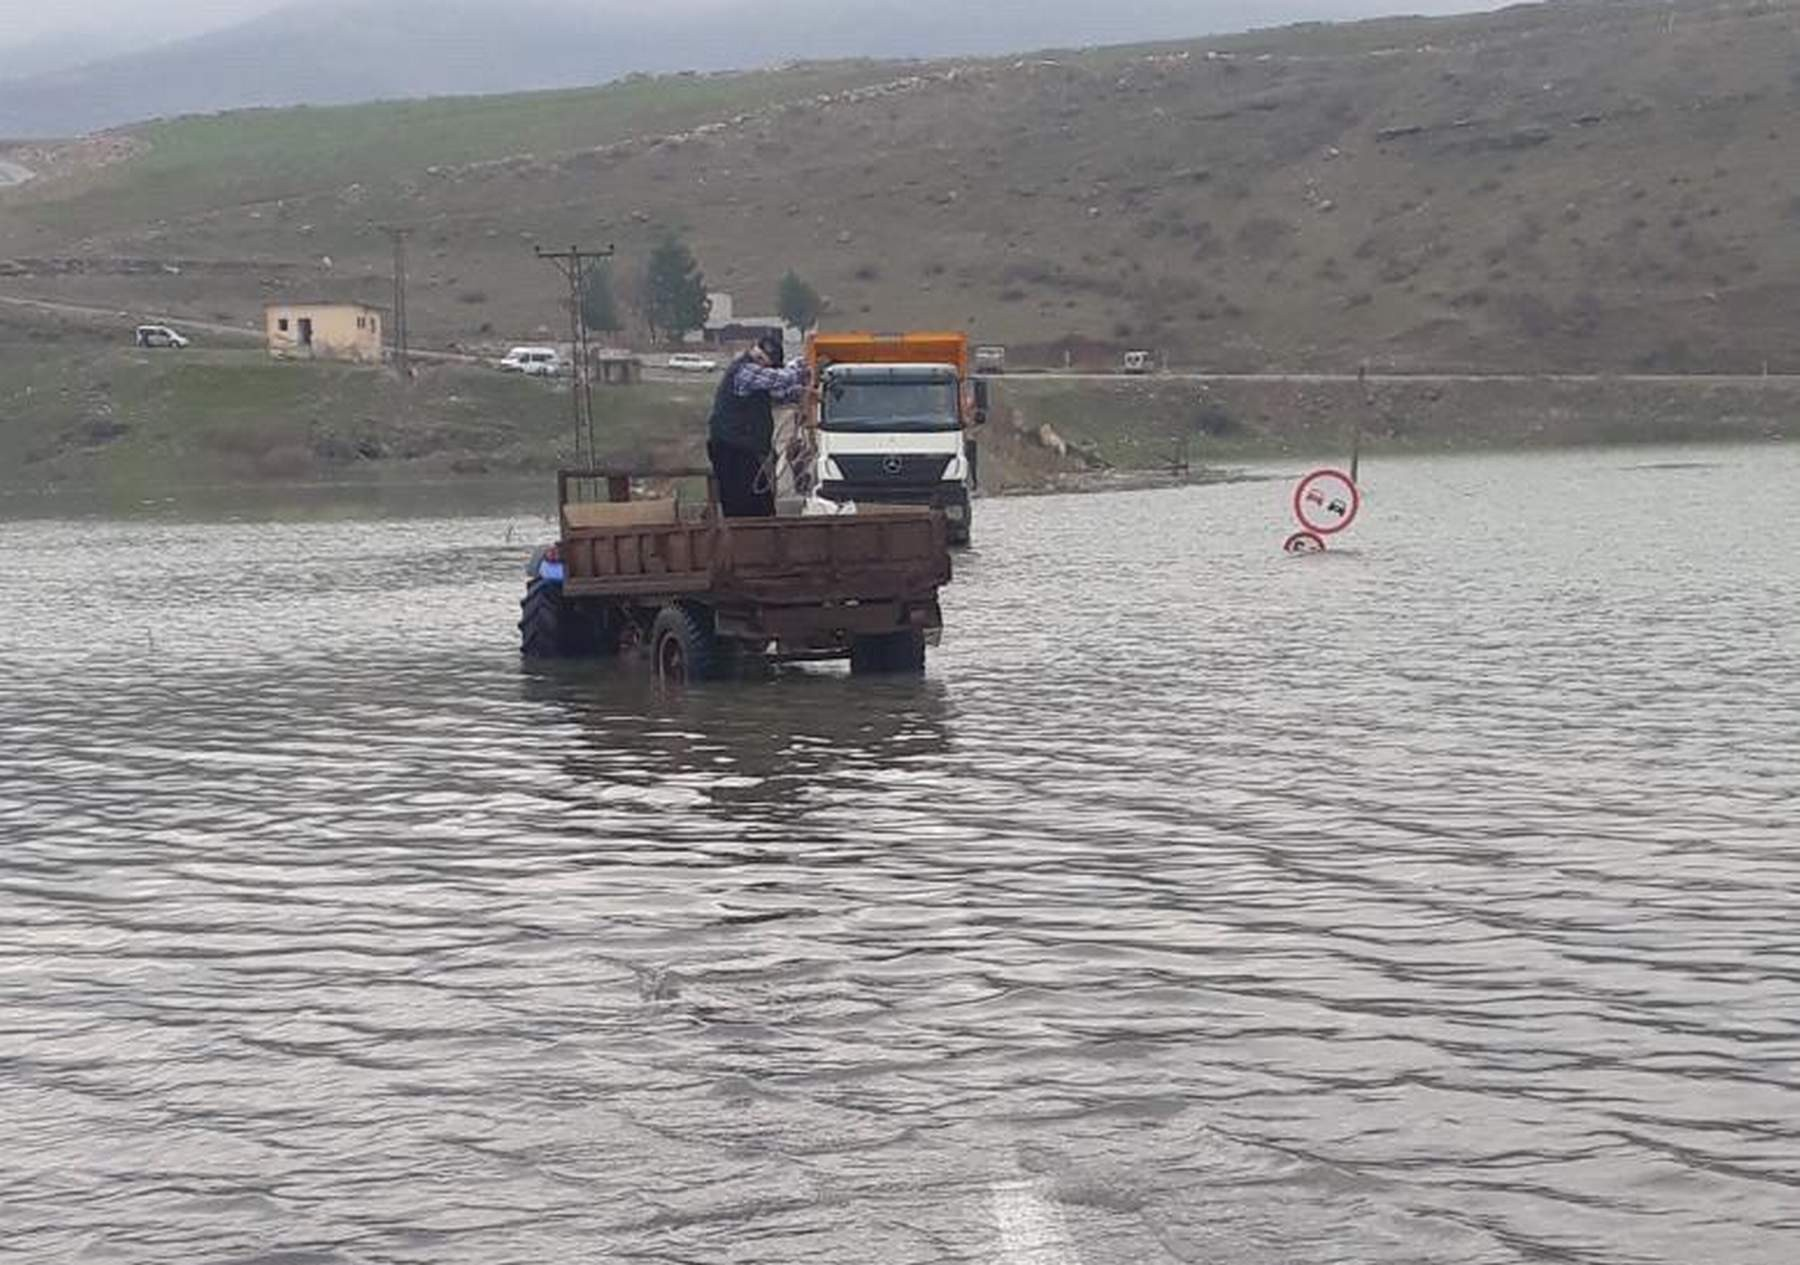 Siirt'te baraj suyu yükseldi, 1 kişi suda mahsur kaldı